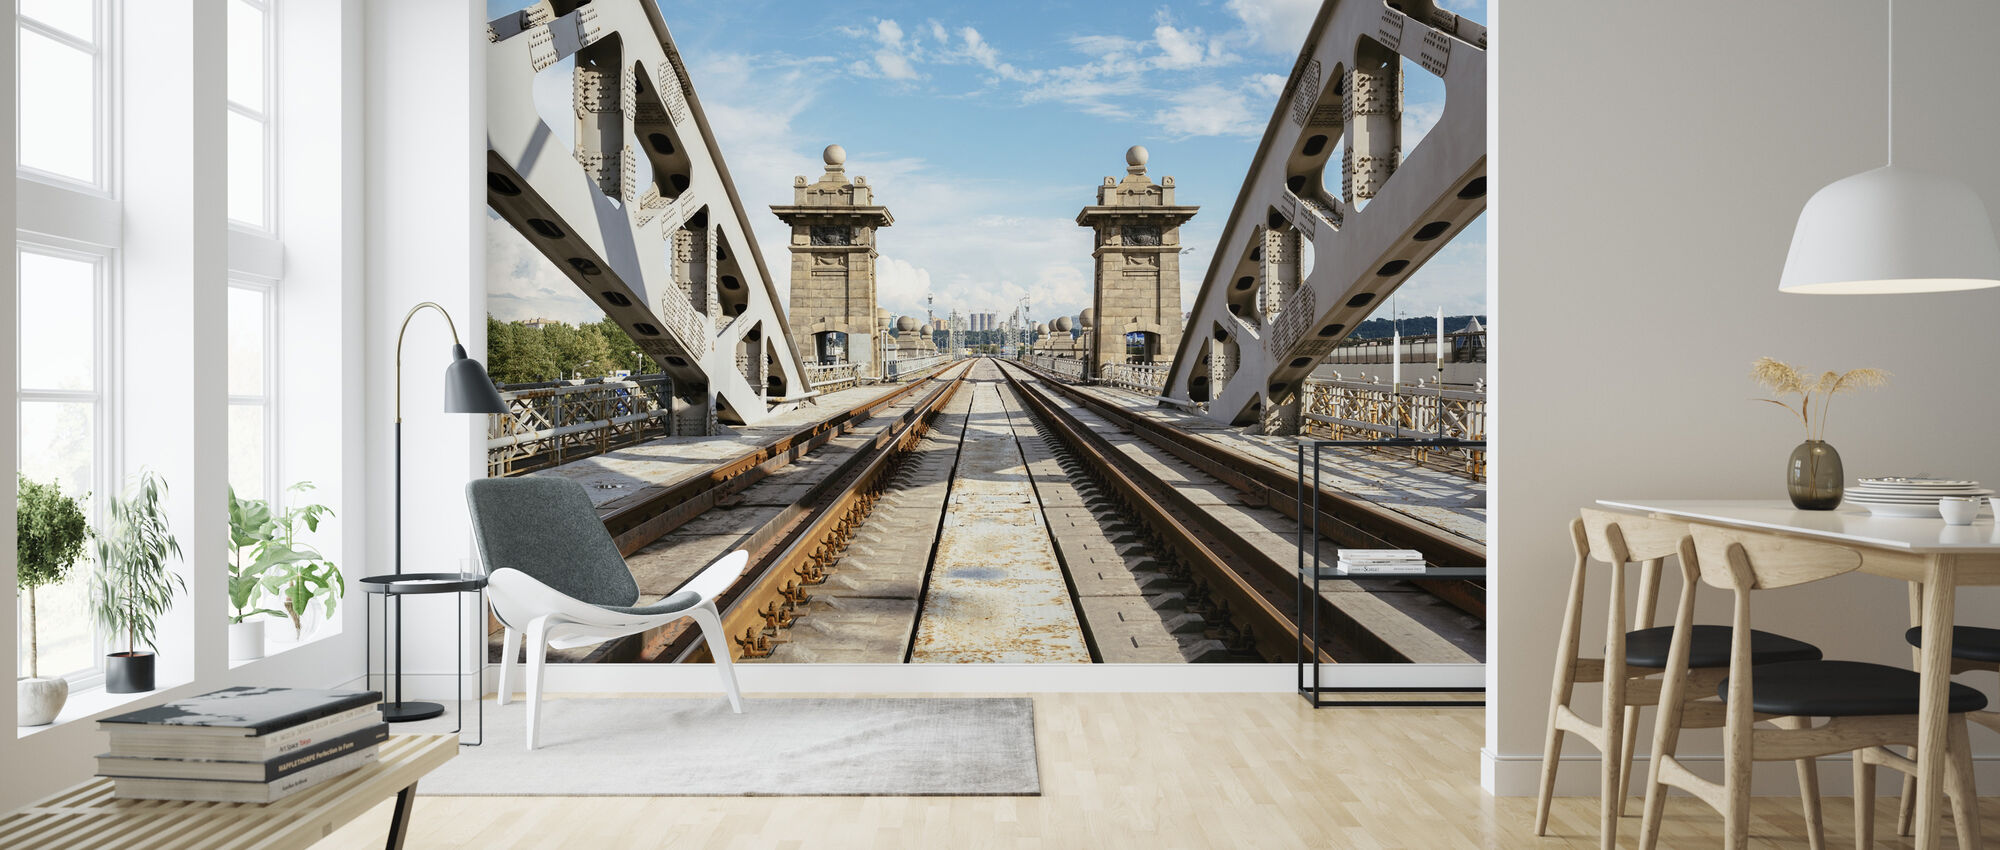 Railroad Bridge in Moscow - Wallpaper - Living Room